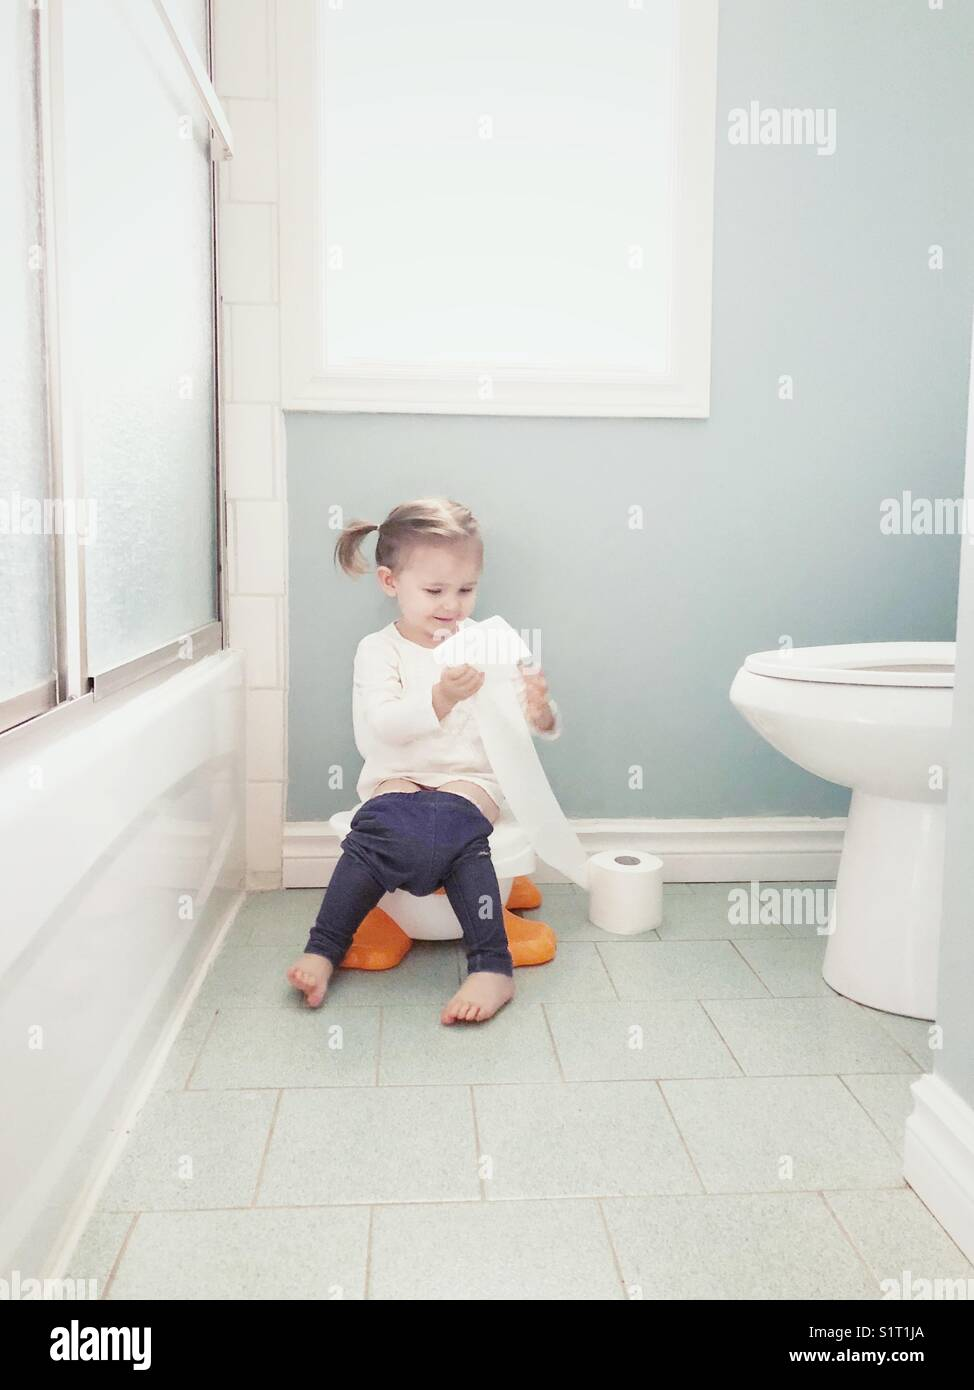 Mature man play on toilet